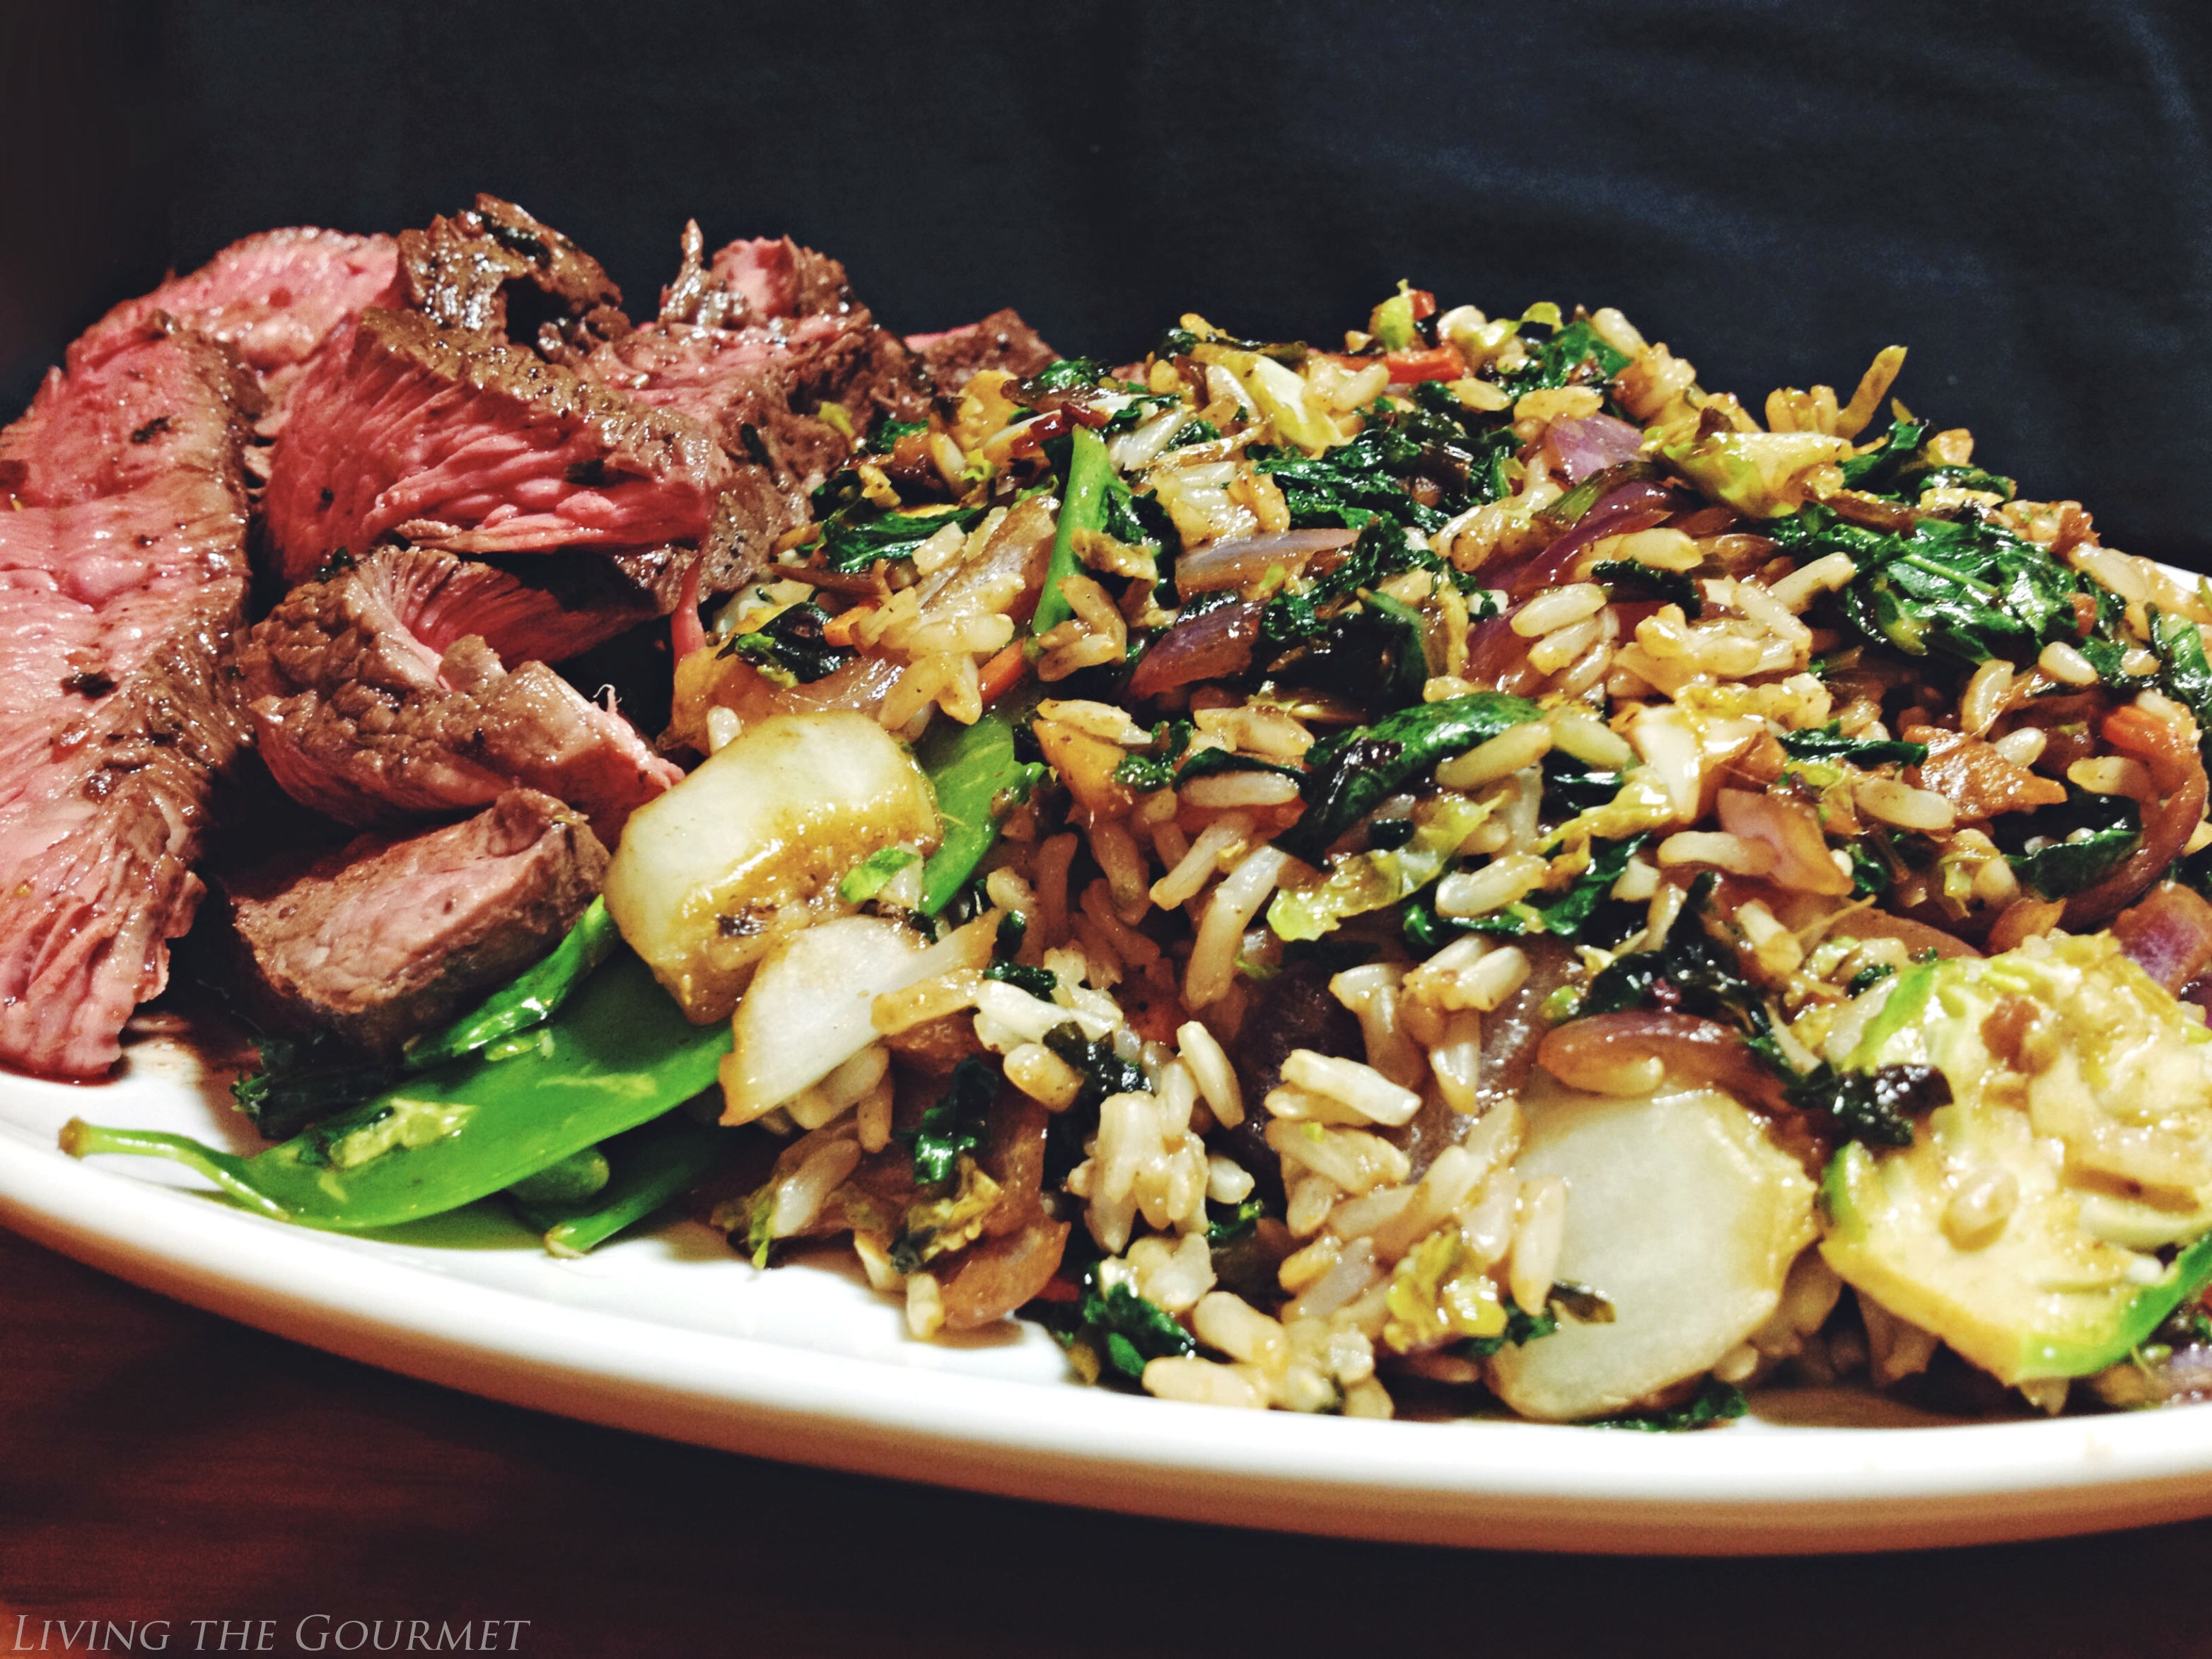 Living the Gourmet: Eat Smart®: Salad Kits Shanghai Blend Stir Fry Kit